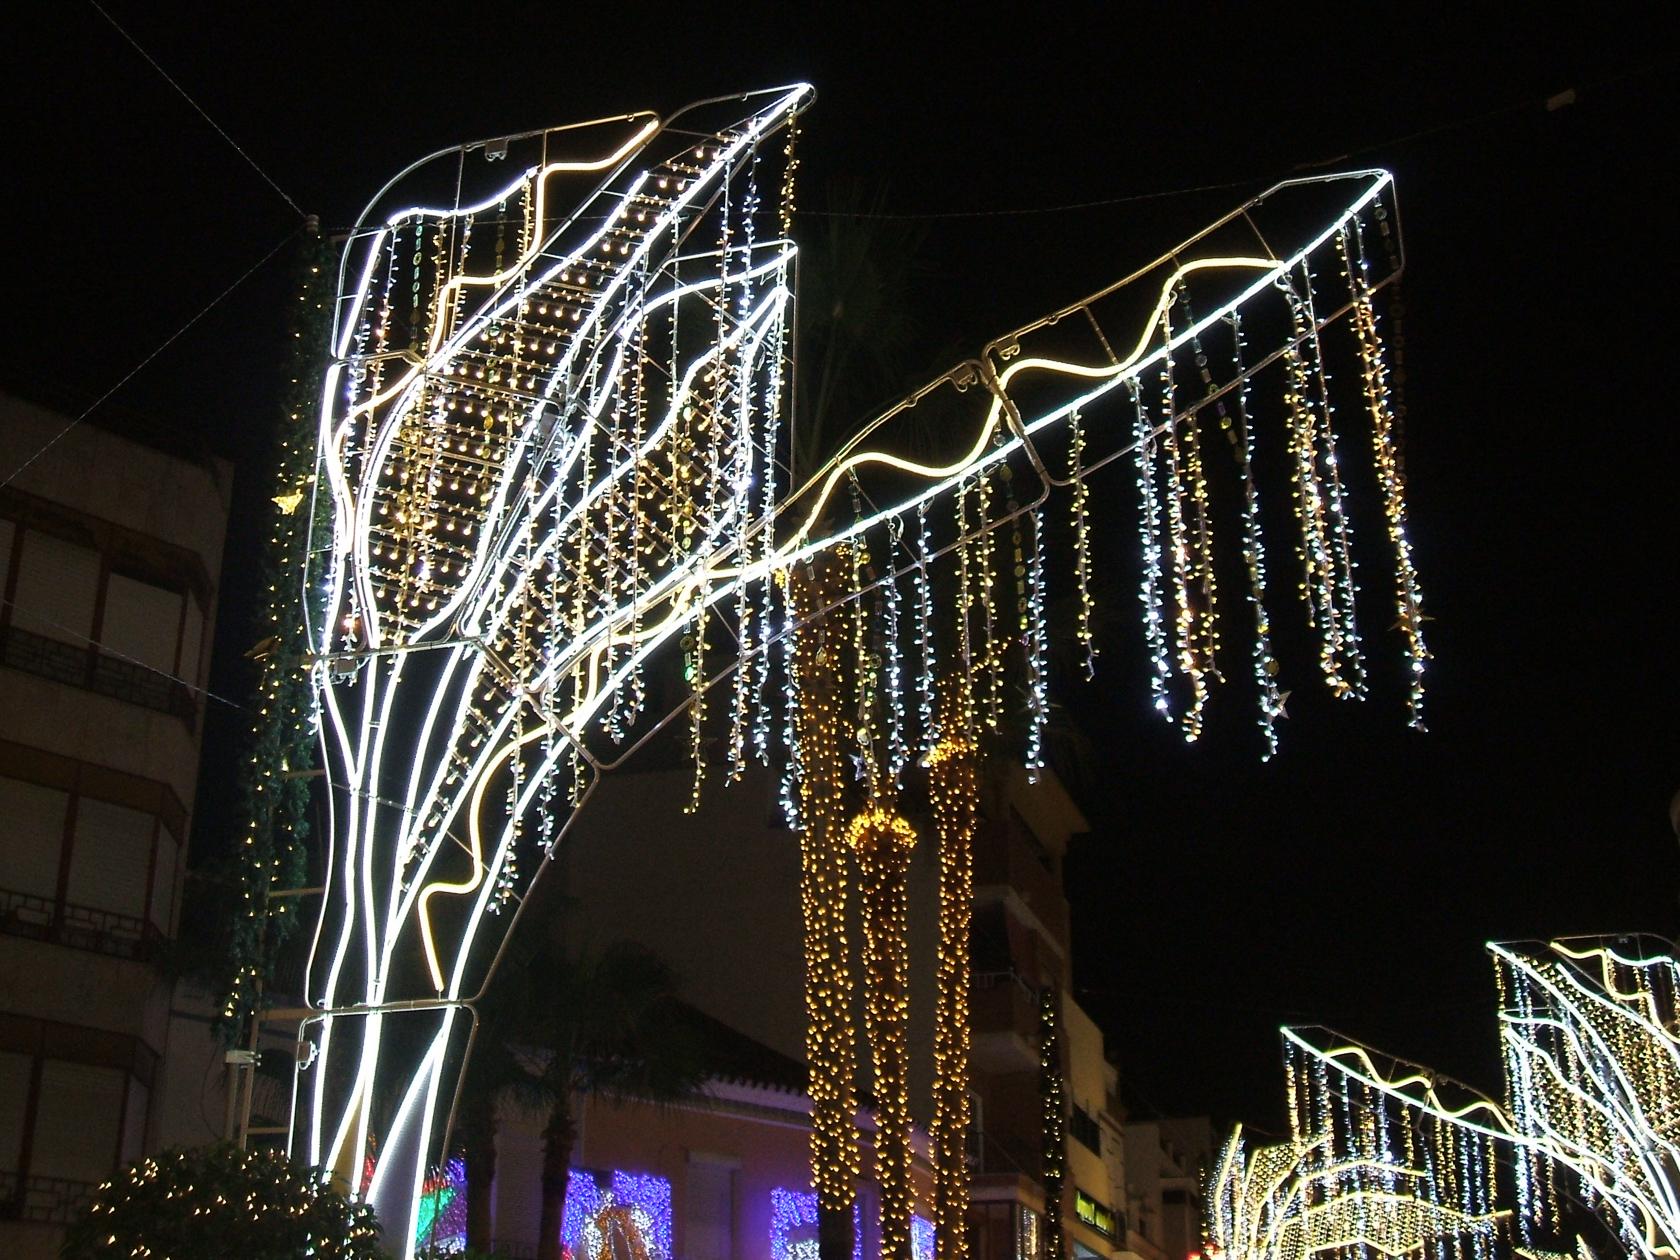 Puente Genil Christmas 2017 Lights